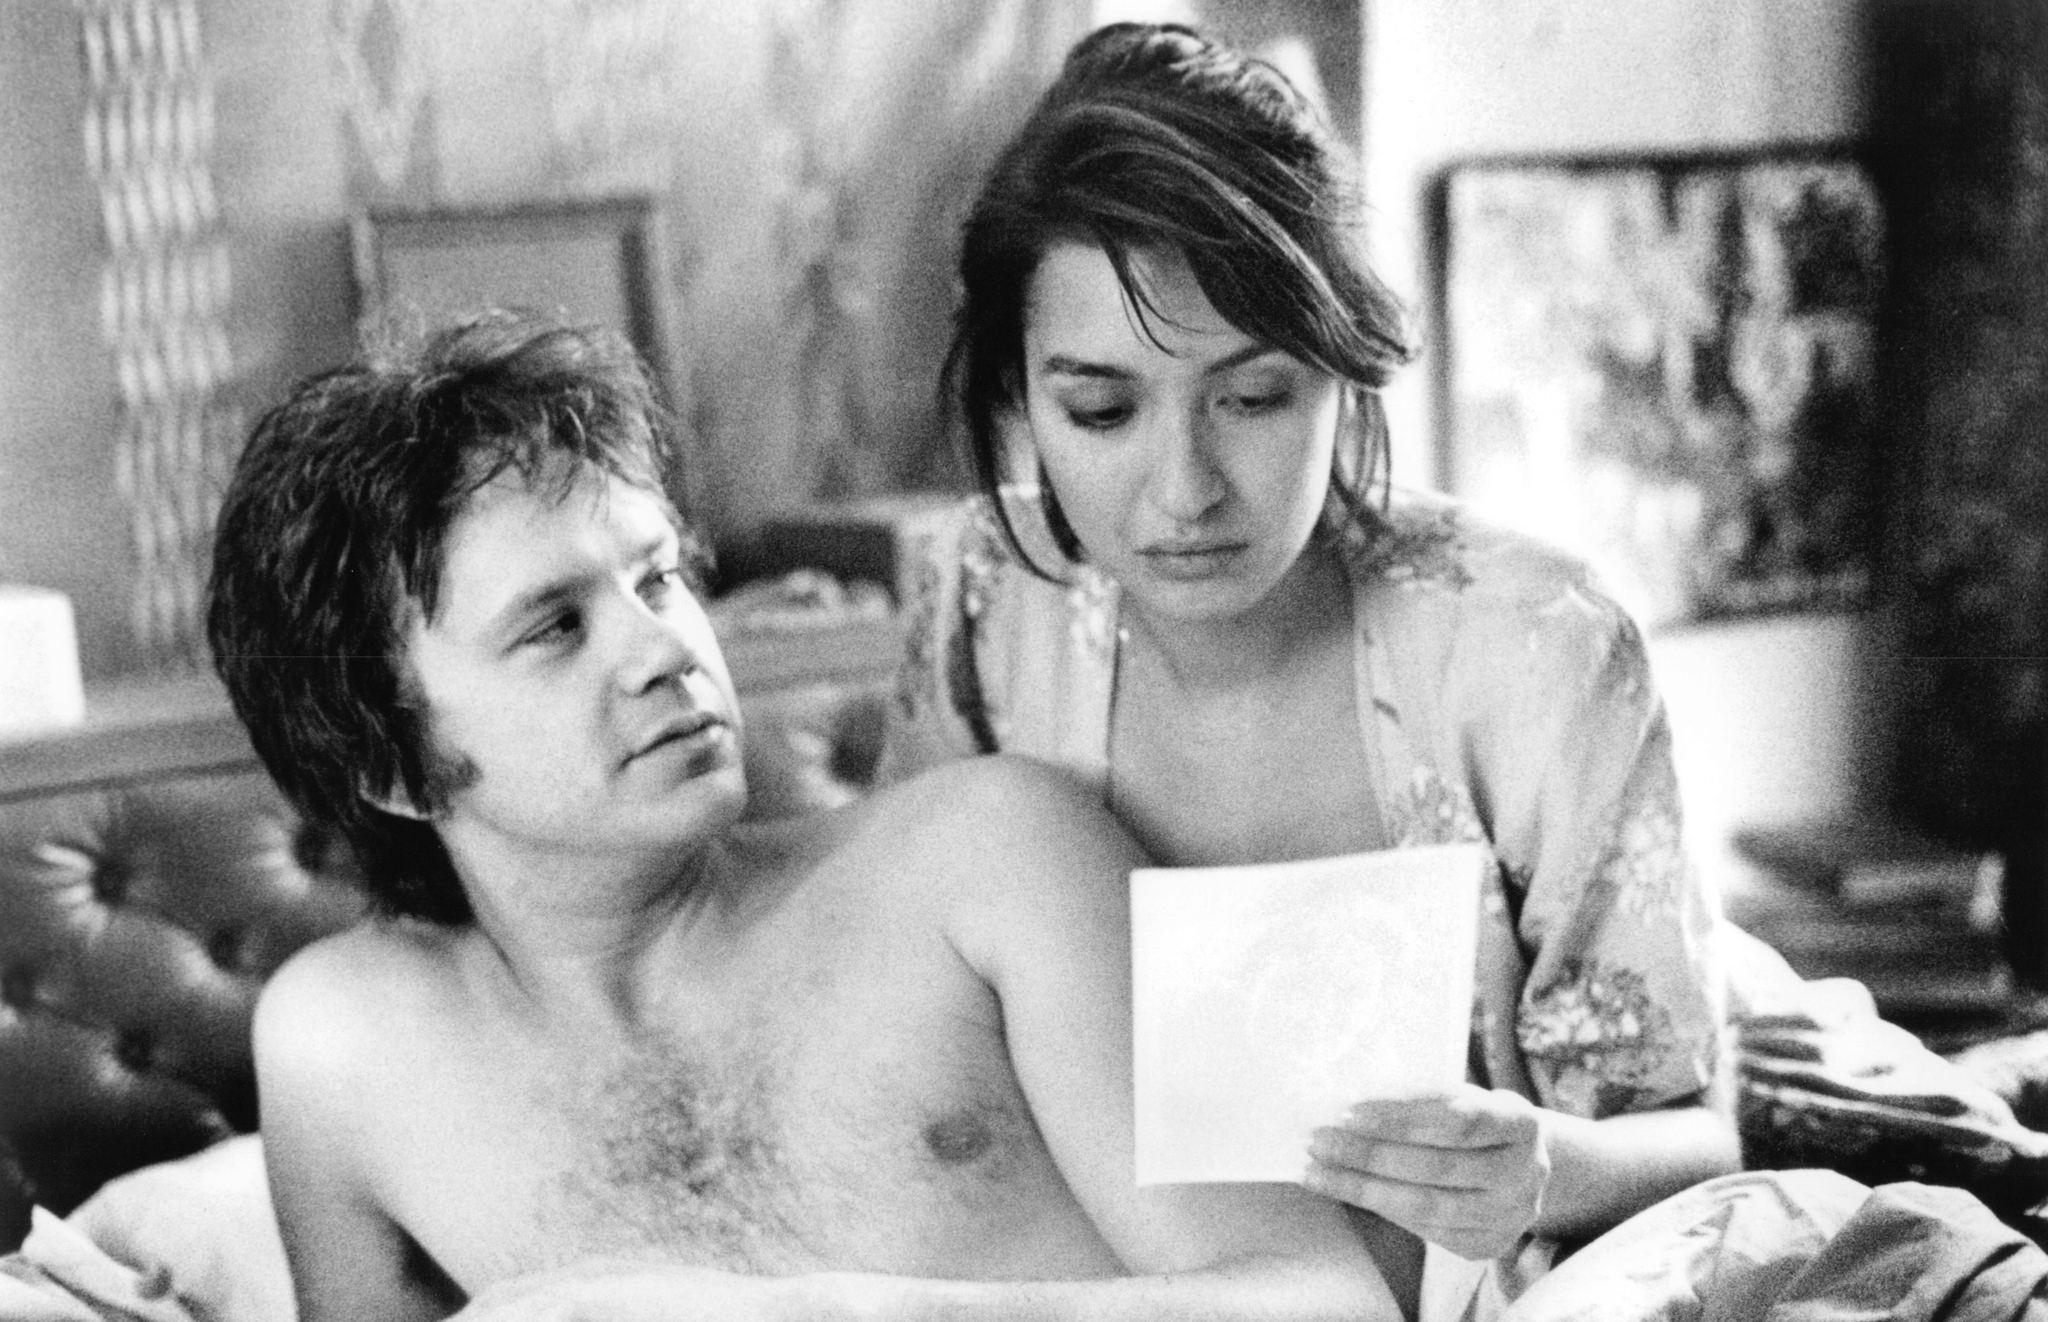 Tim Robbins and Elizabeth Peña in Jacob's Ladder (1990)